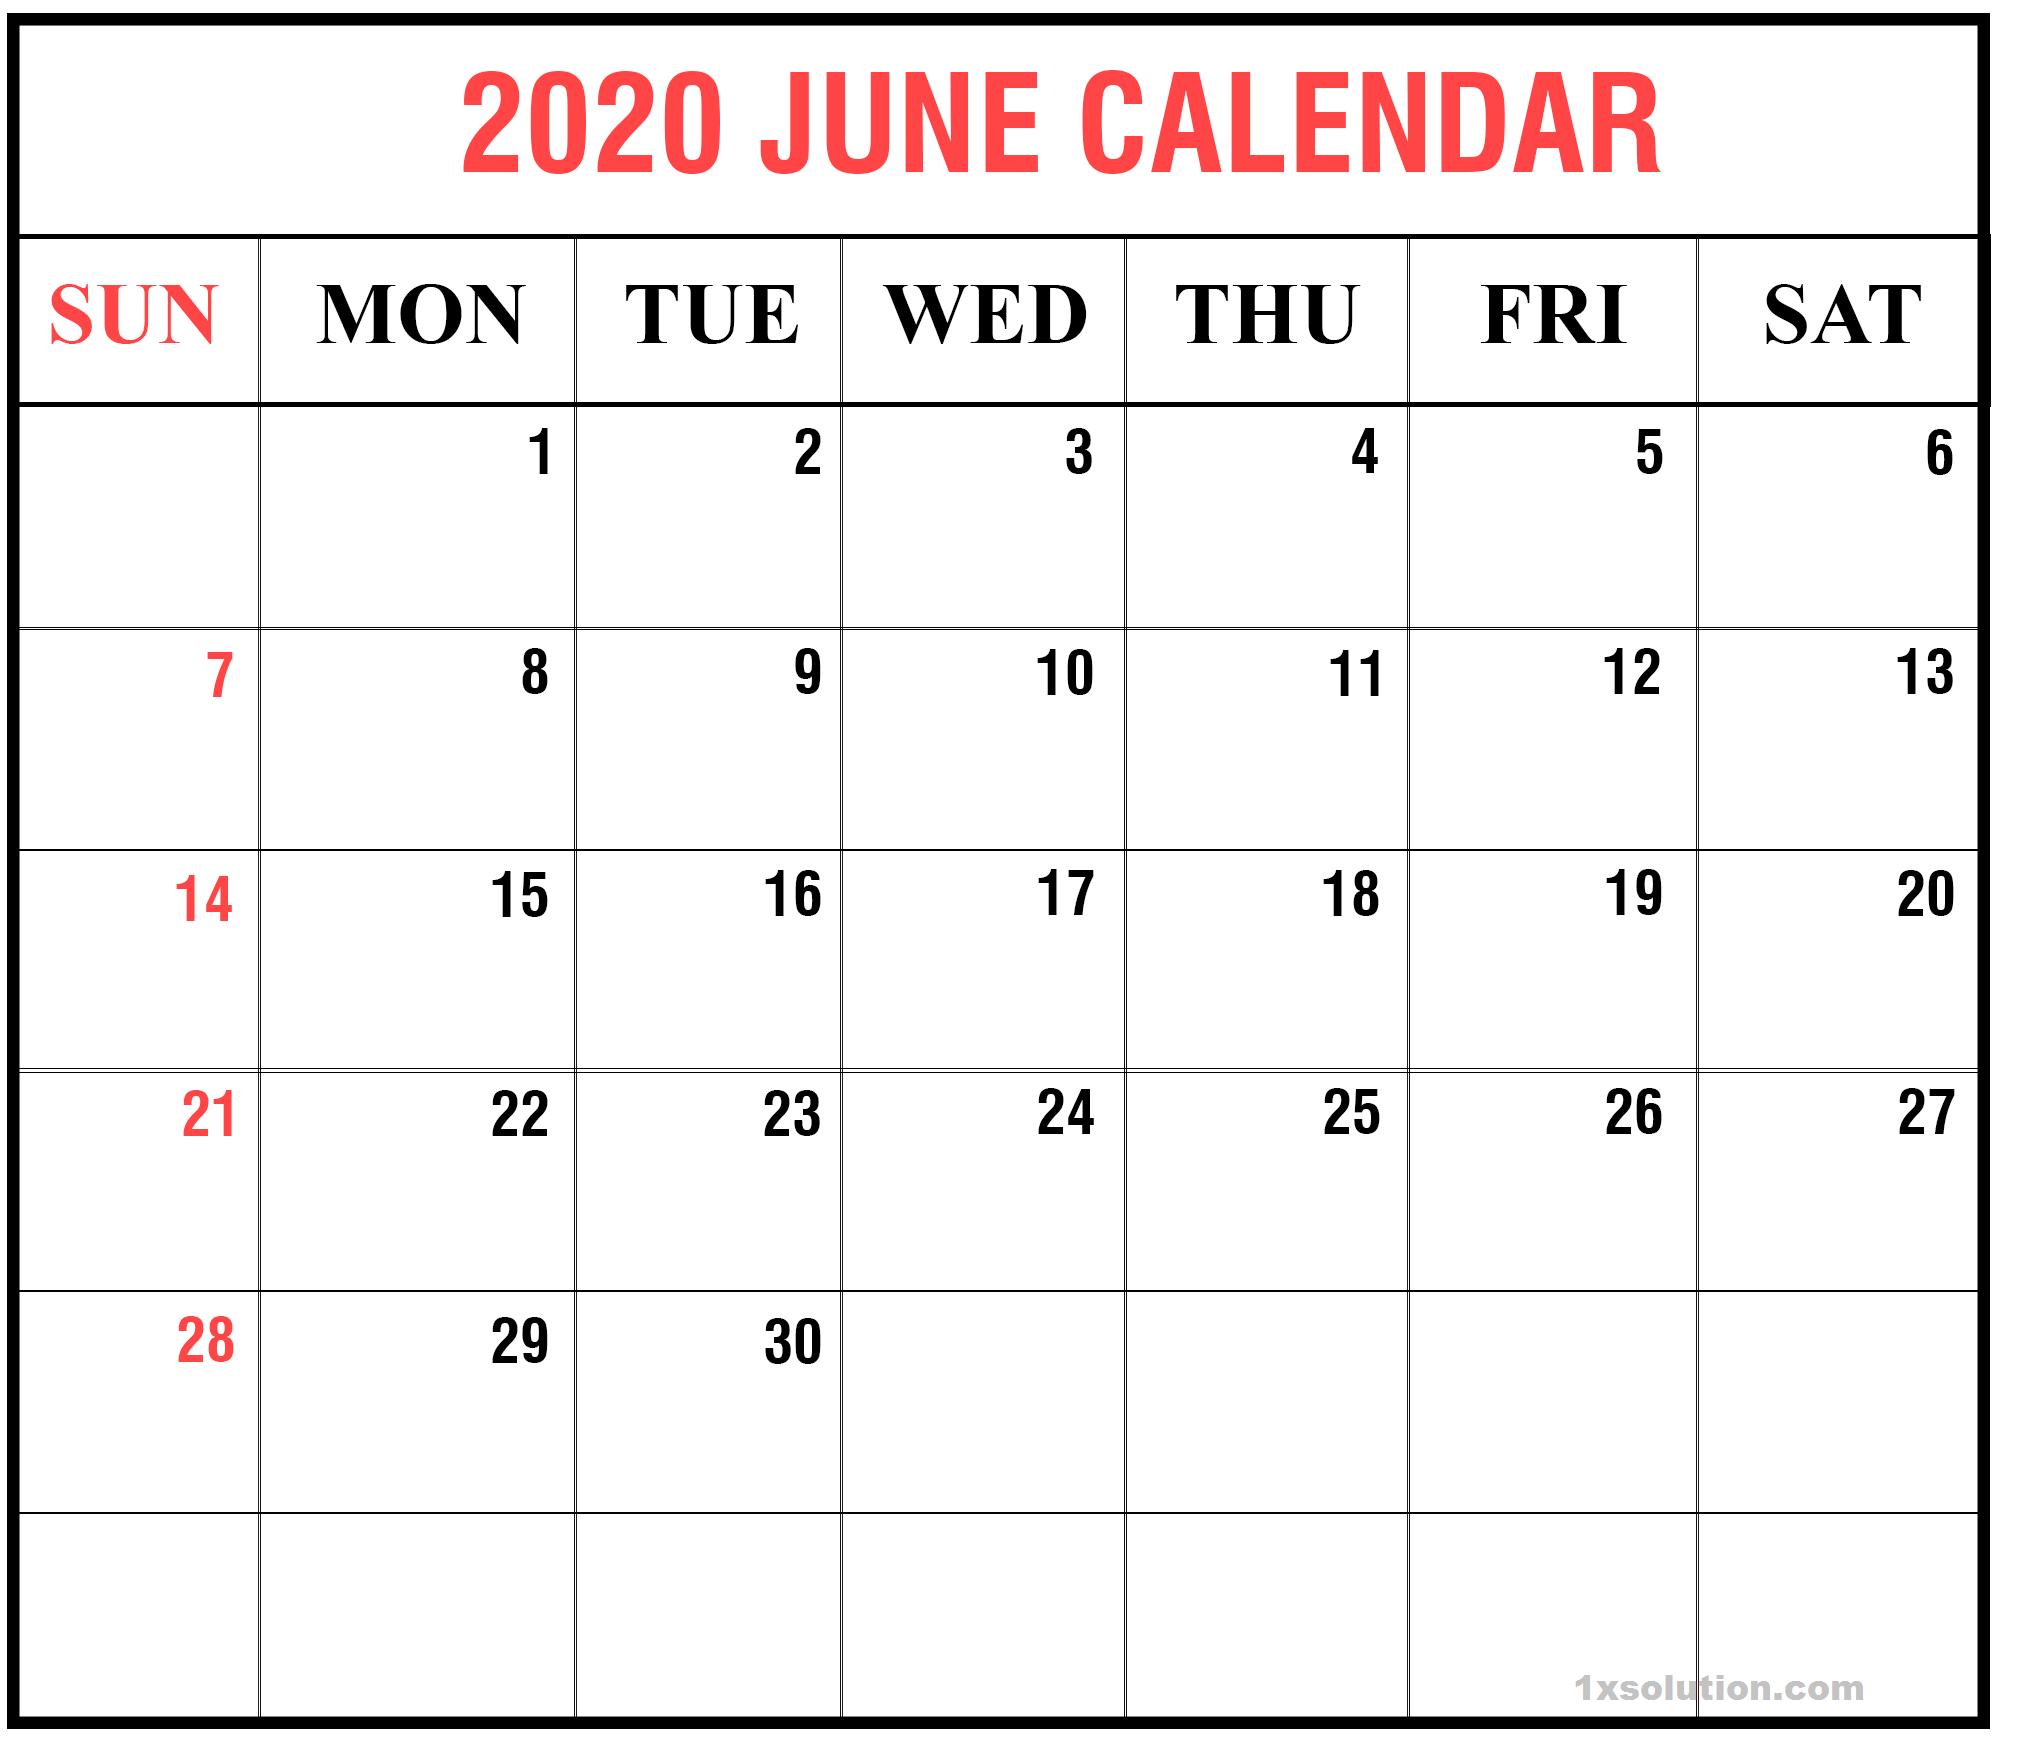 Calendar June 2020